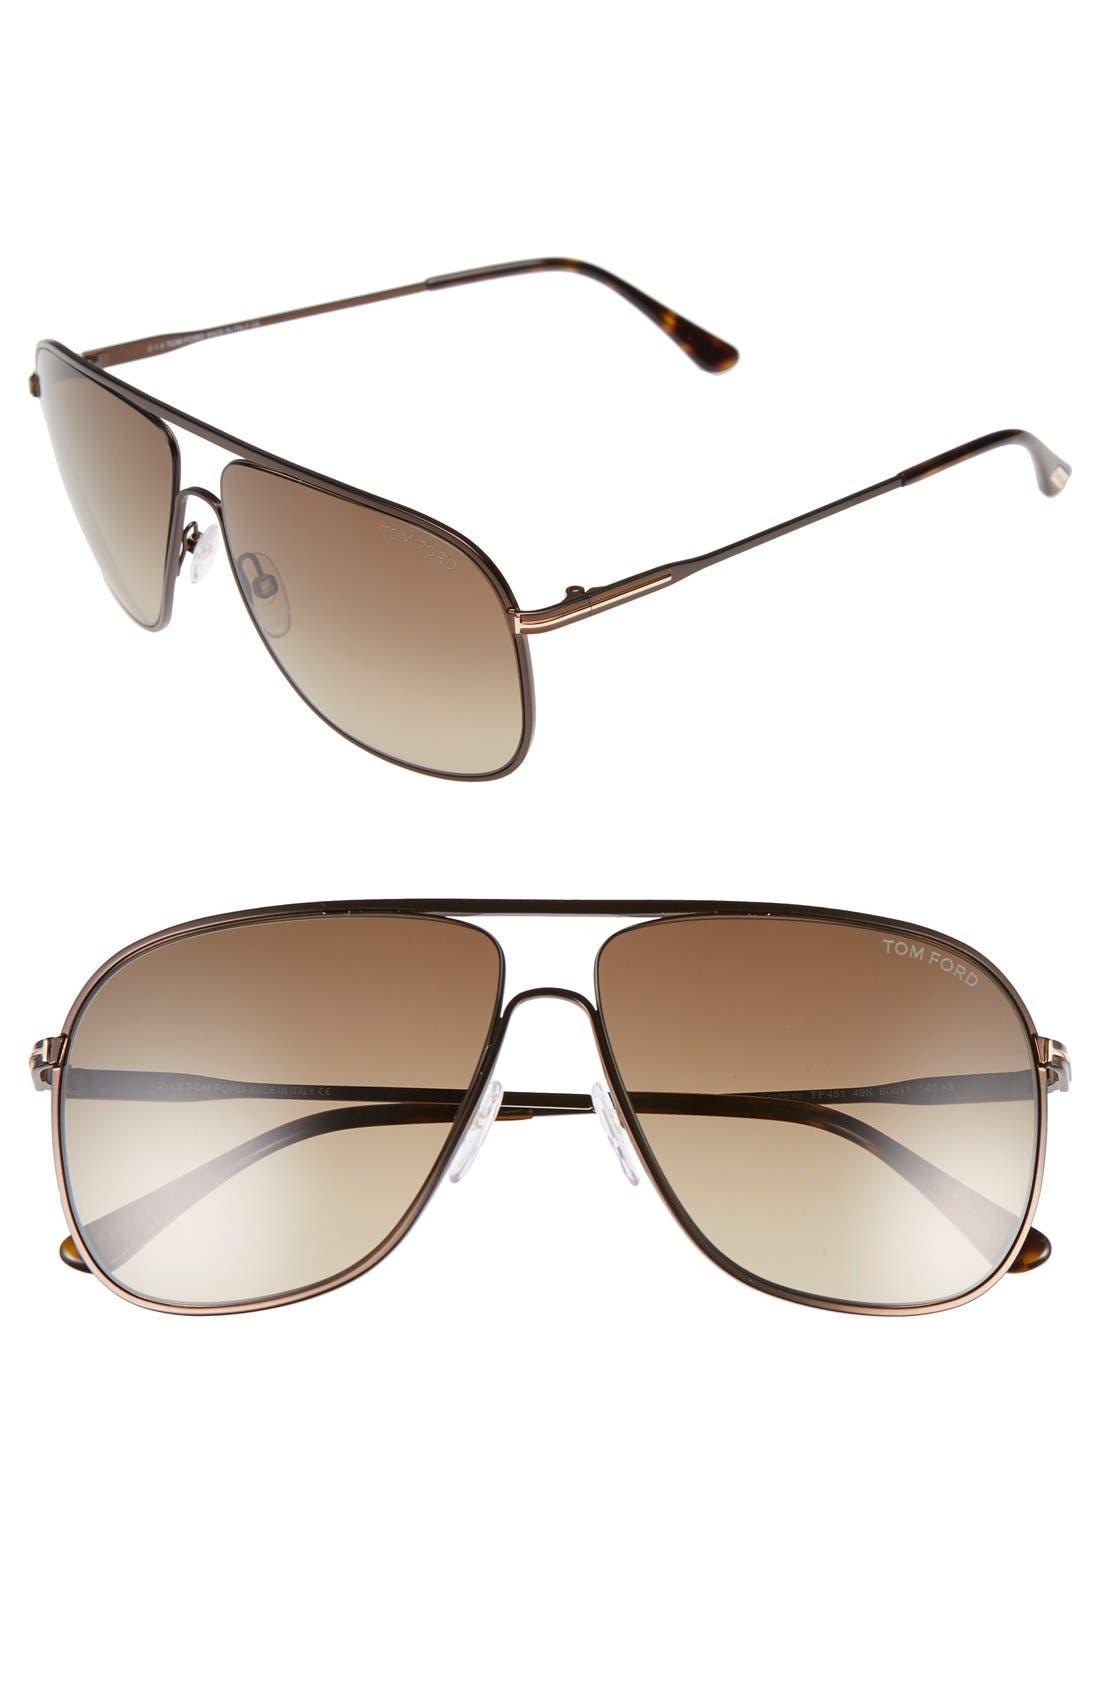 Tom Ford 60mm Matte Aviator Sunglasses